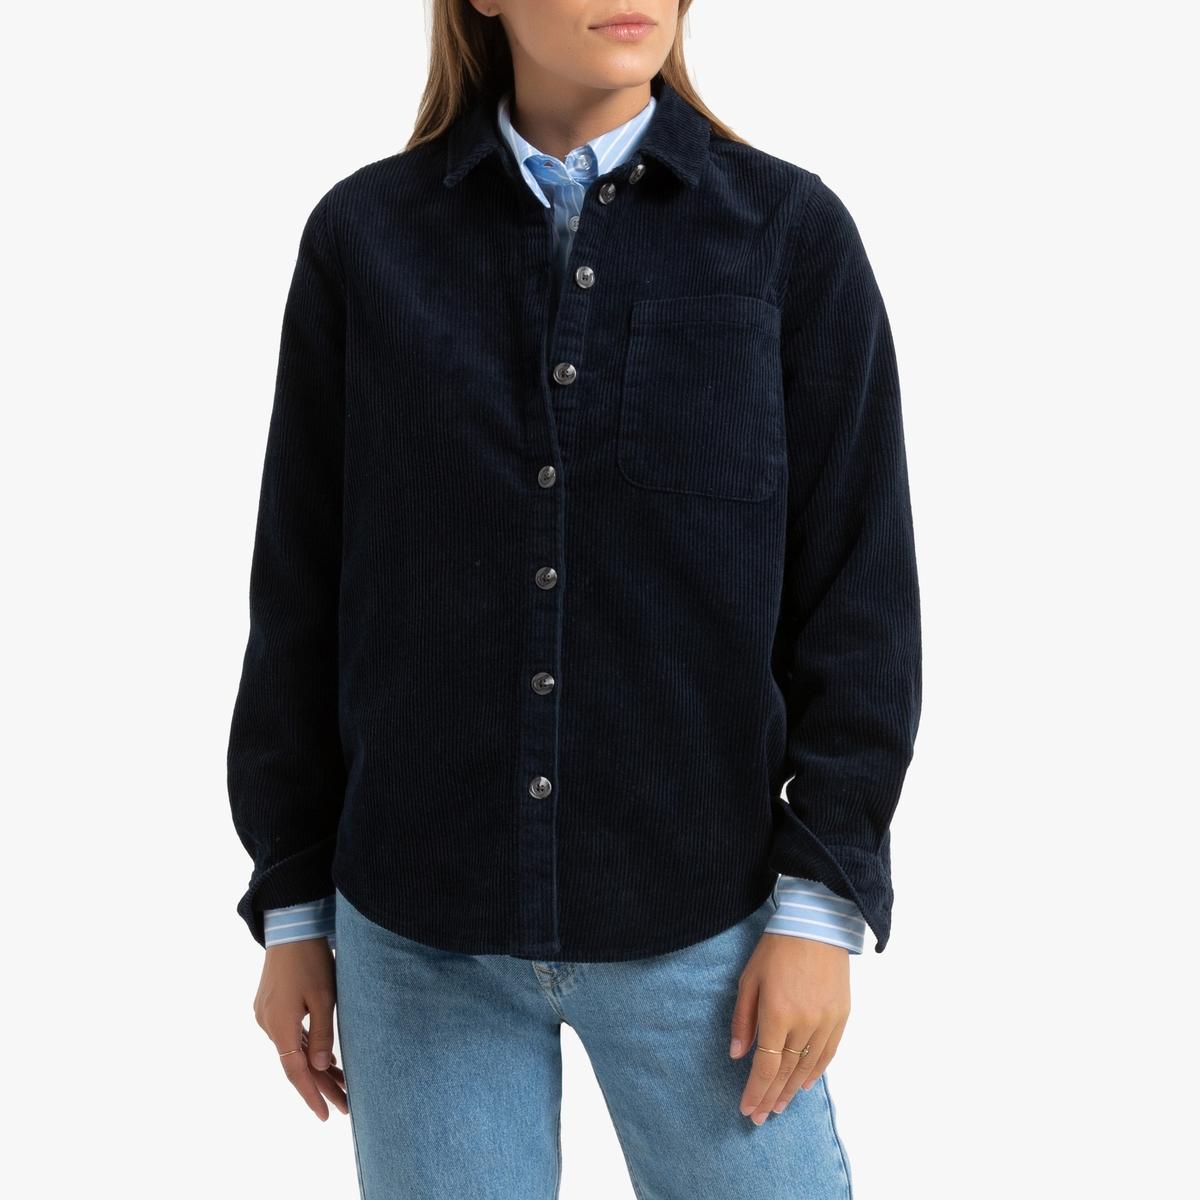 Рубашка La Redoute С длинными рукавами из велюра 38 (FR) - 44 (RUS) синий брюки чино la redoute la redoute 38 fr 44 rus синий